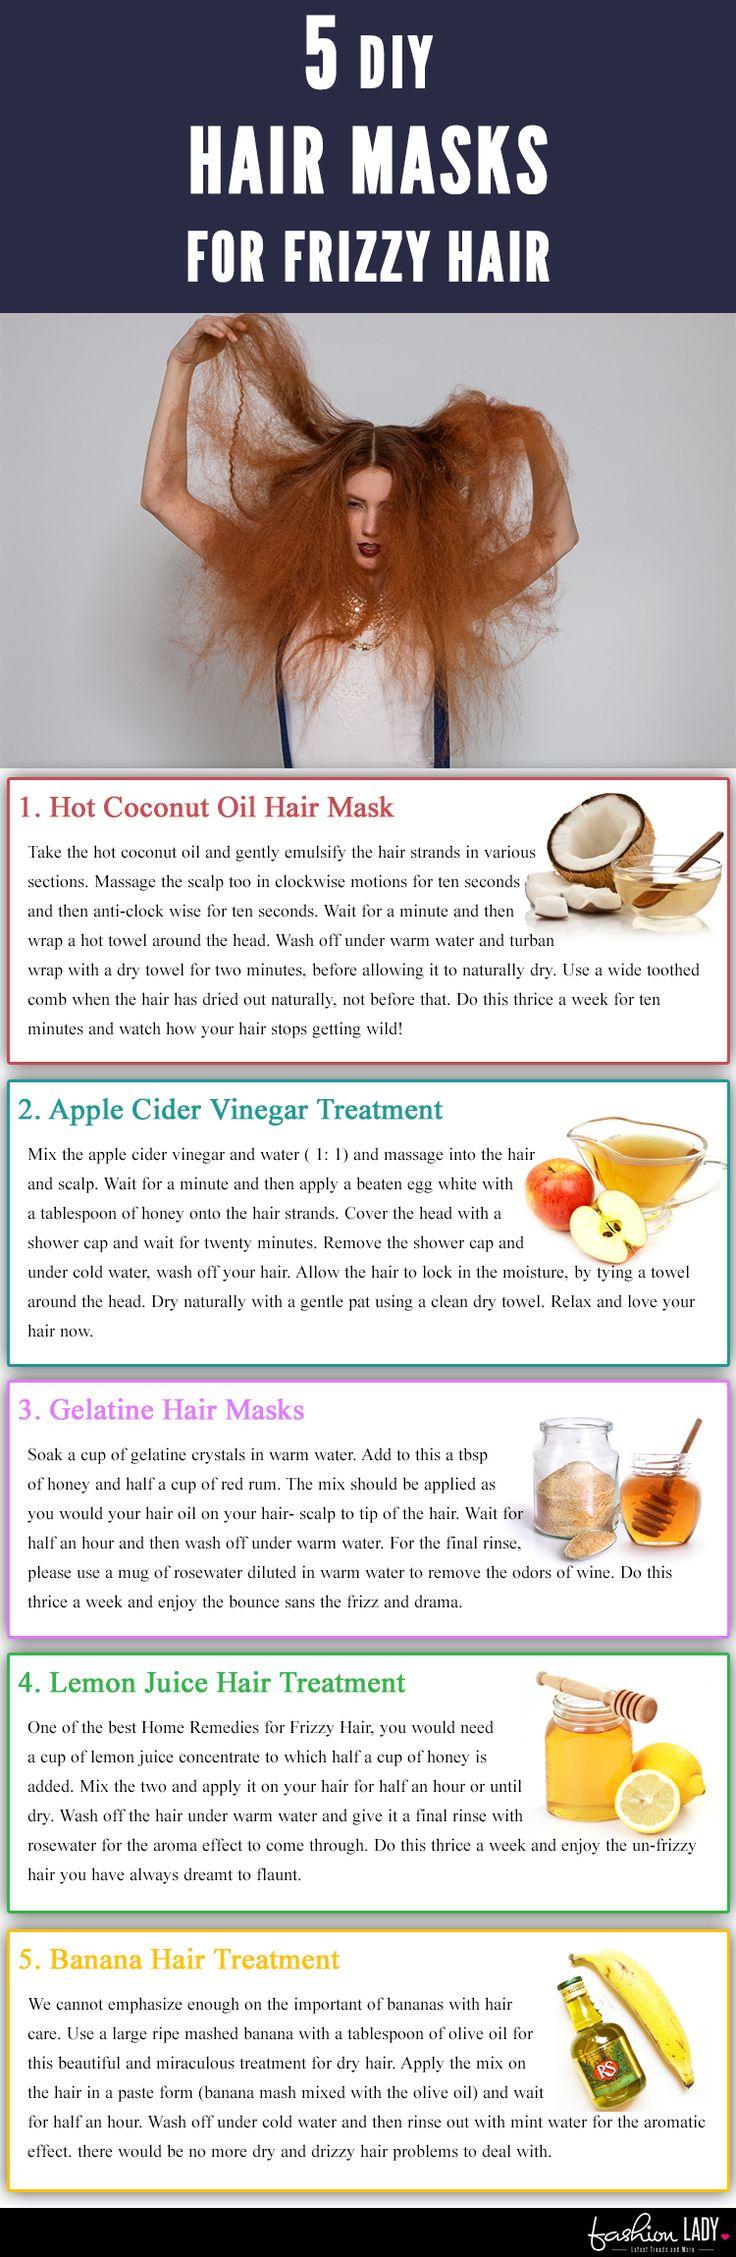 5 DIY Hair Masks For Frizzy Hair